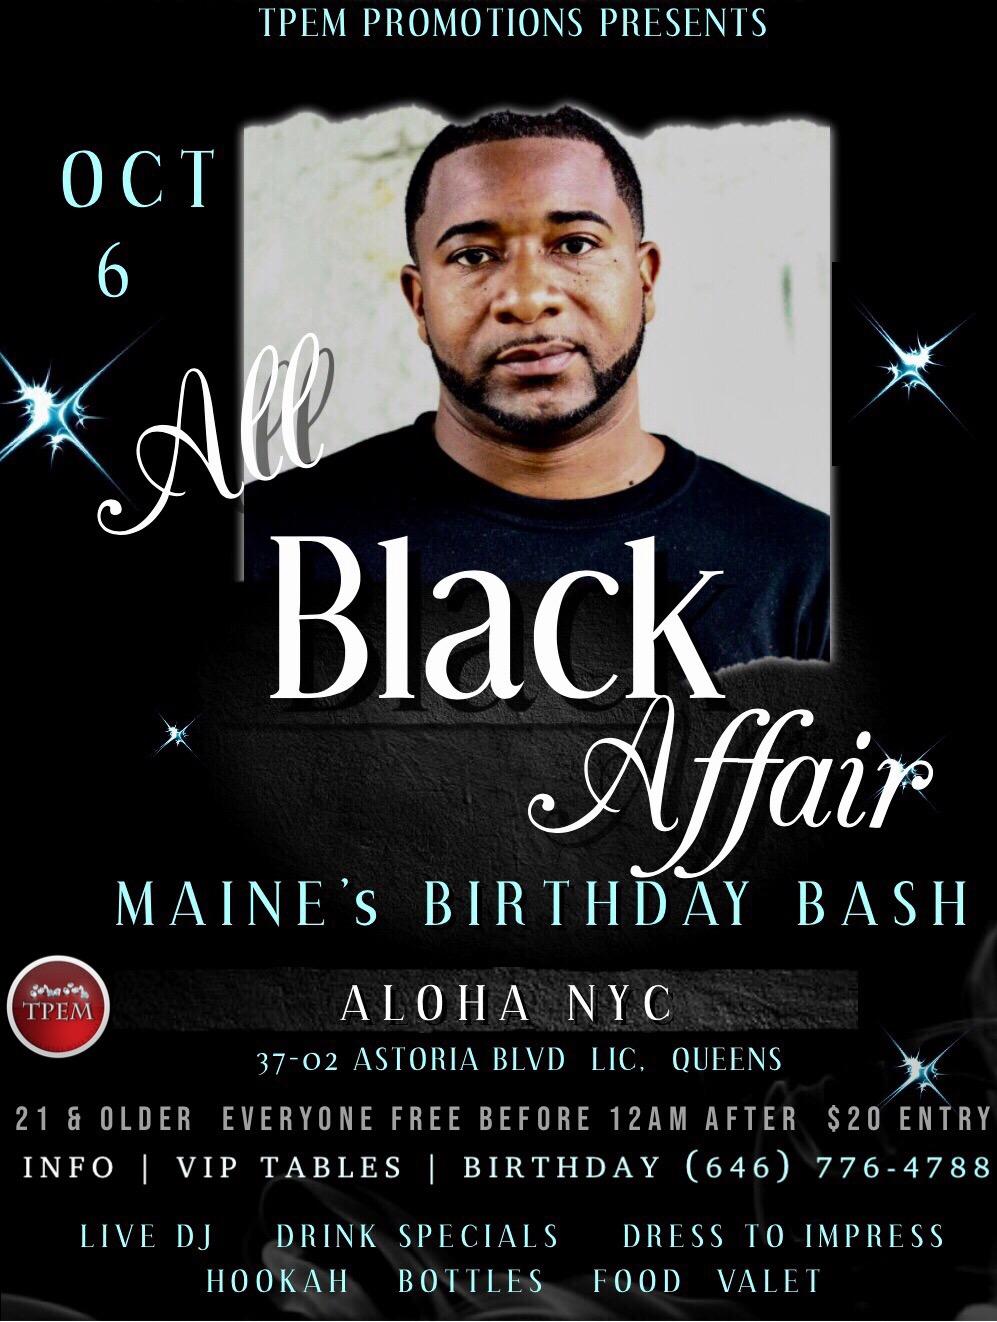 all black affair maine s birthday bash tickets sat oct 6 2018